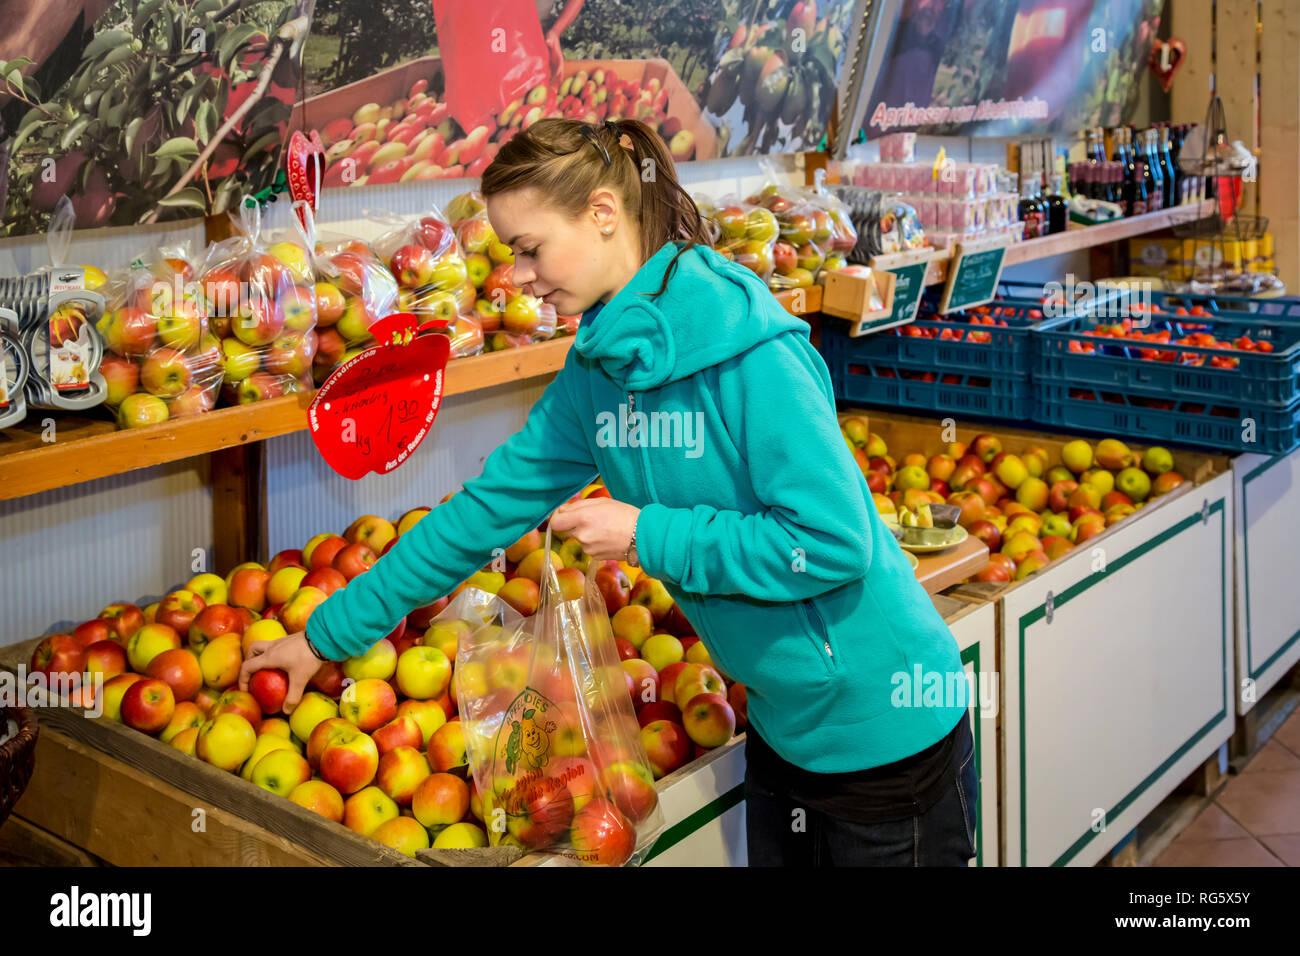 Customer buys apples at farm shop, Kundin kauft €pfel im Hofladen Stock Photo